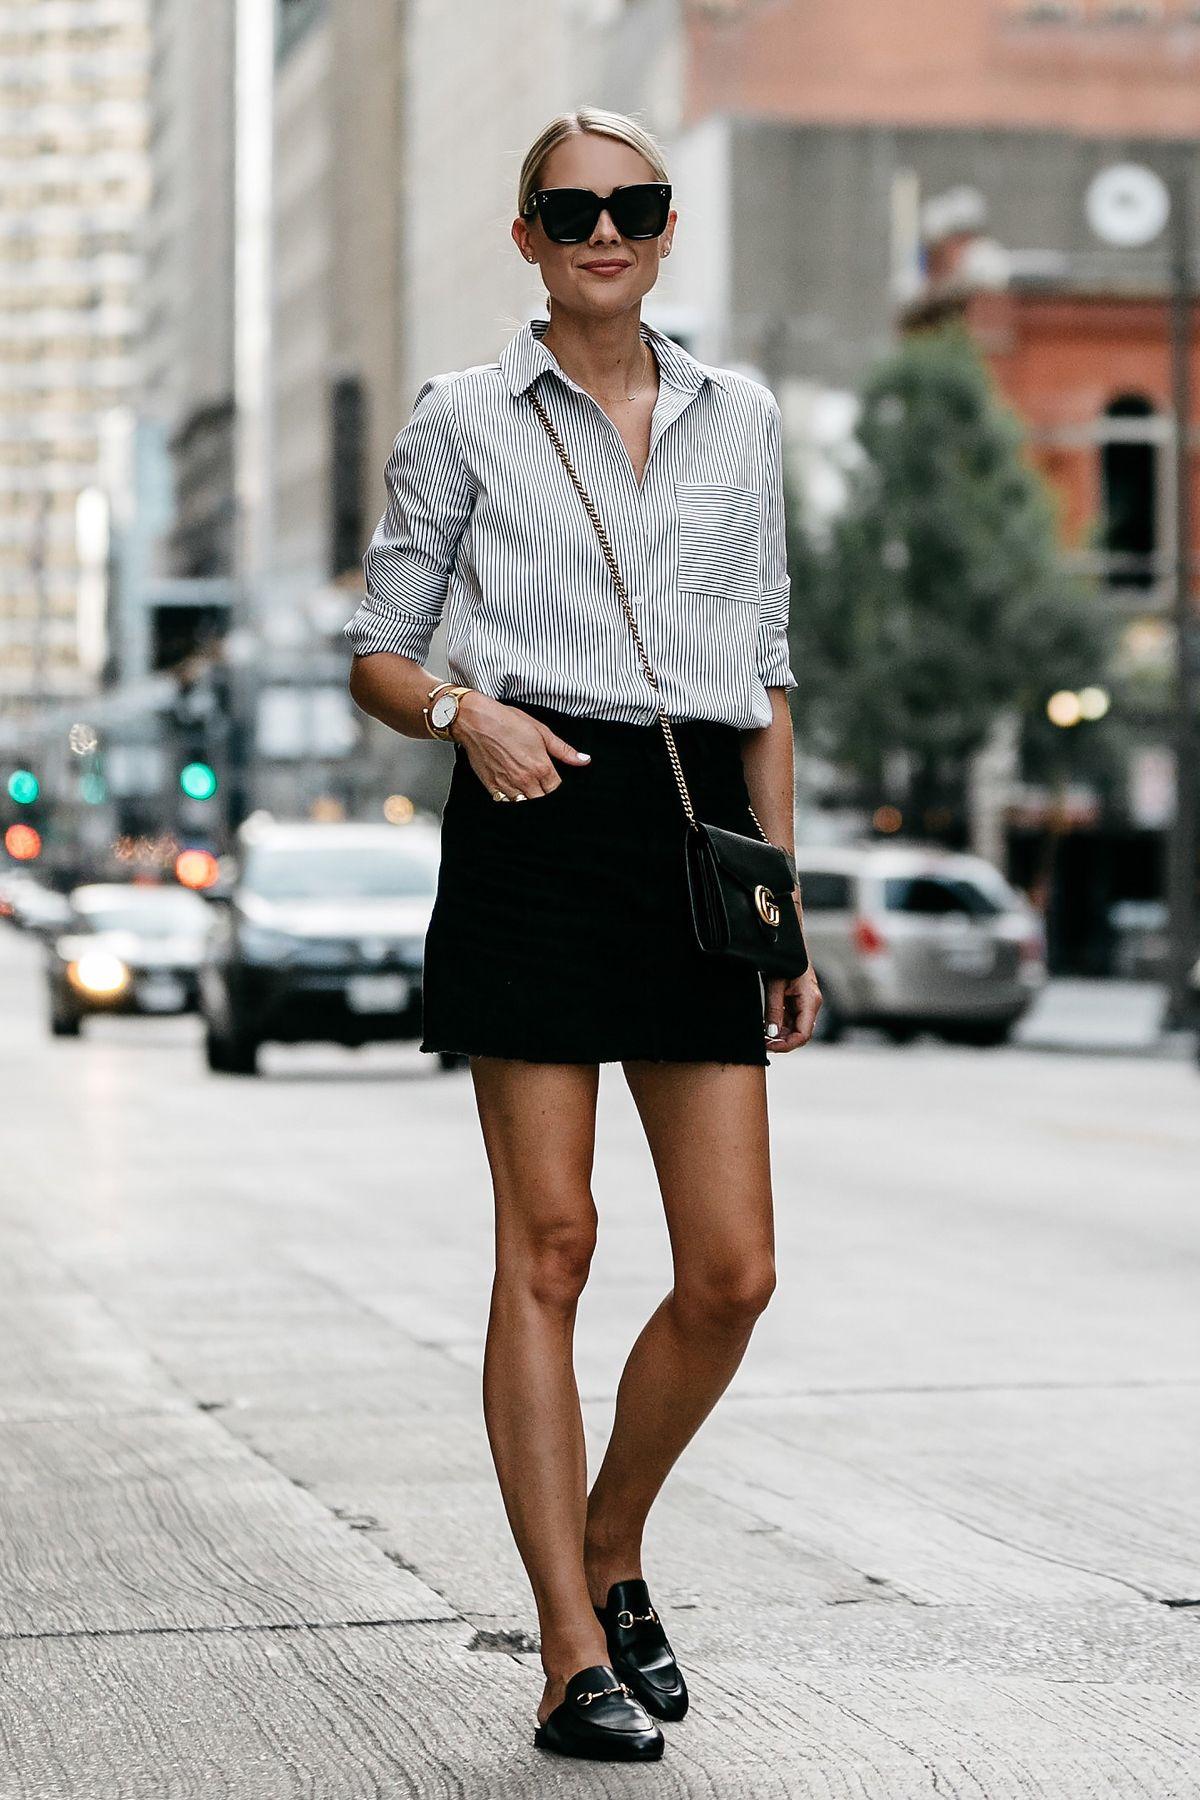 62eef08a4d0 Blonde Wearing Nordstrom Black and White Stripe Shirt Black Denim Skirt  Outfit Gucci Mules Gucci Marmont Handbag Fashion Jackson Dallas Blogger  Fashion ...